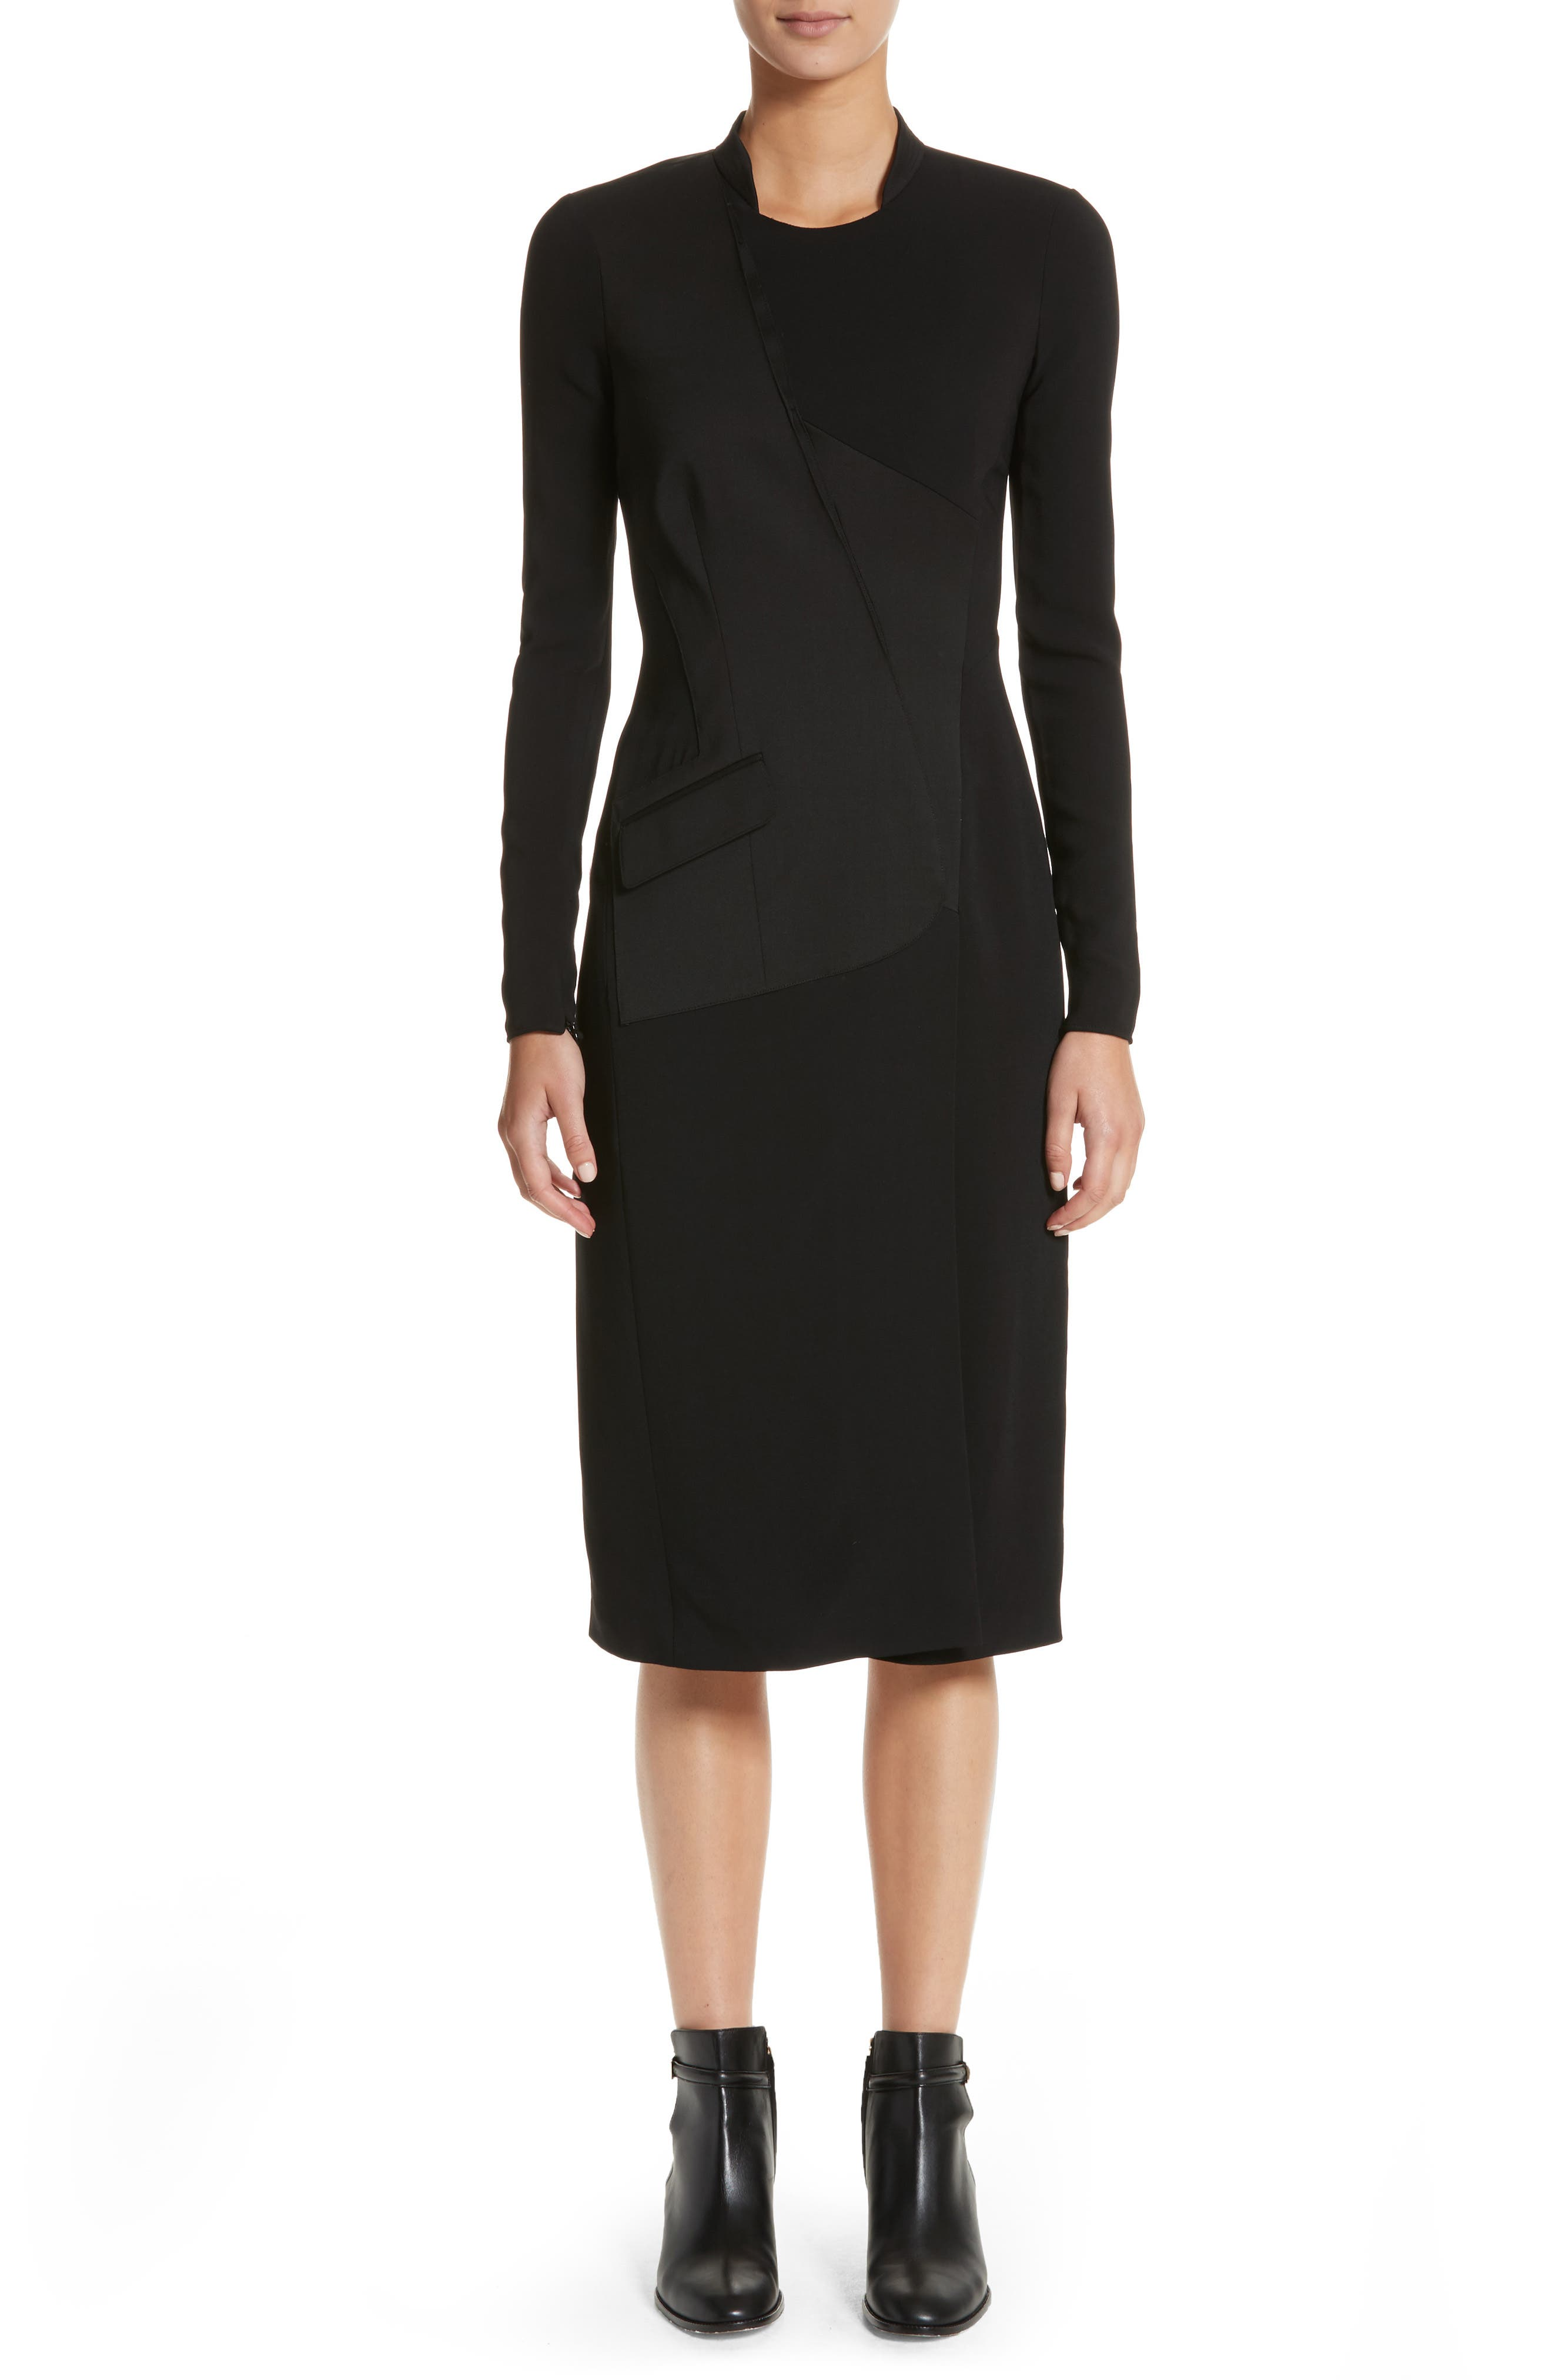 Miriam Sheath Dress,                             Main thumbnail 1, color,                             001